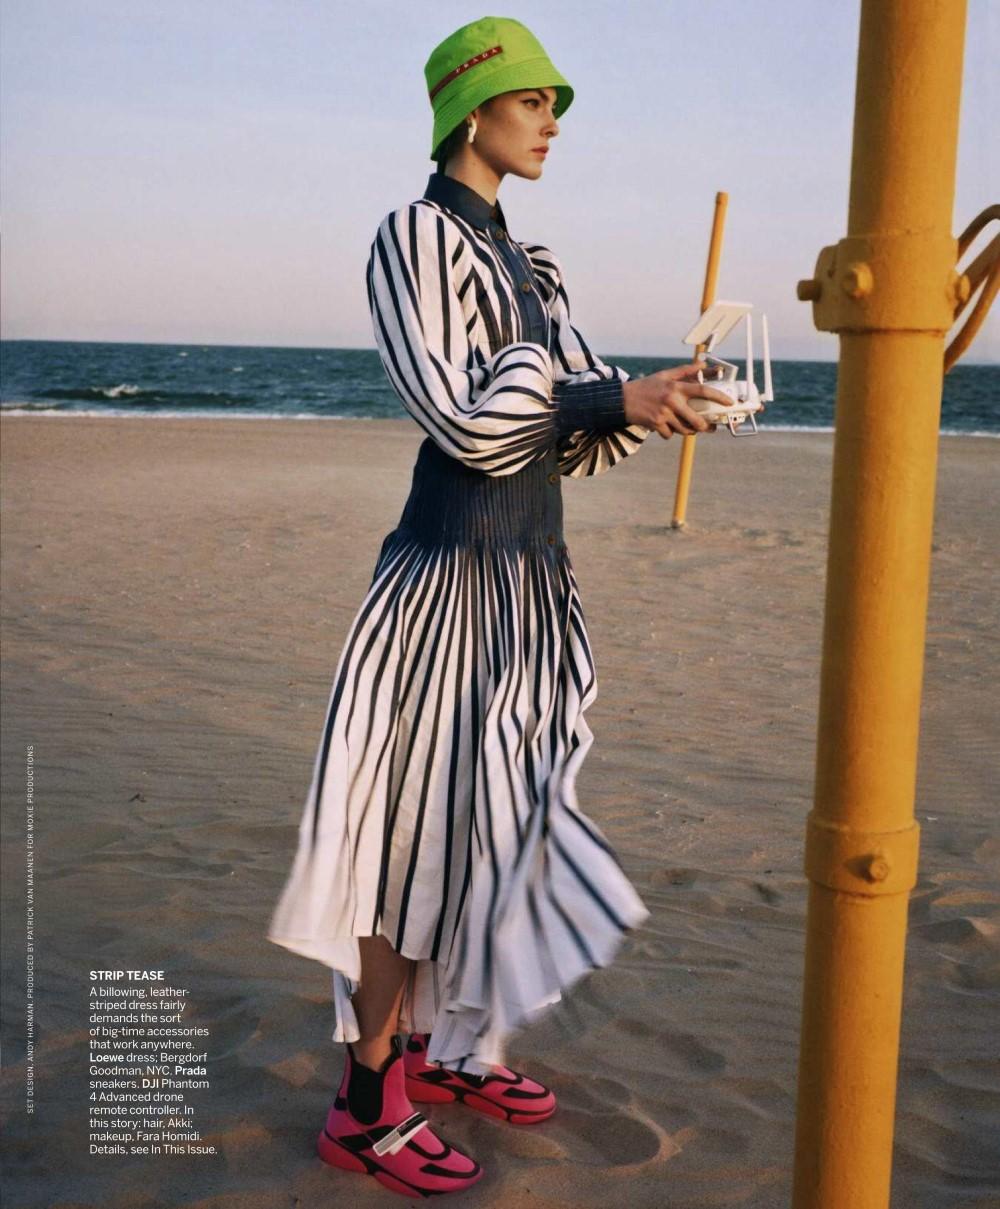 Vittoria Ceretti by Angelo Pennetta Vogue US Sept 2018 (1).jpg